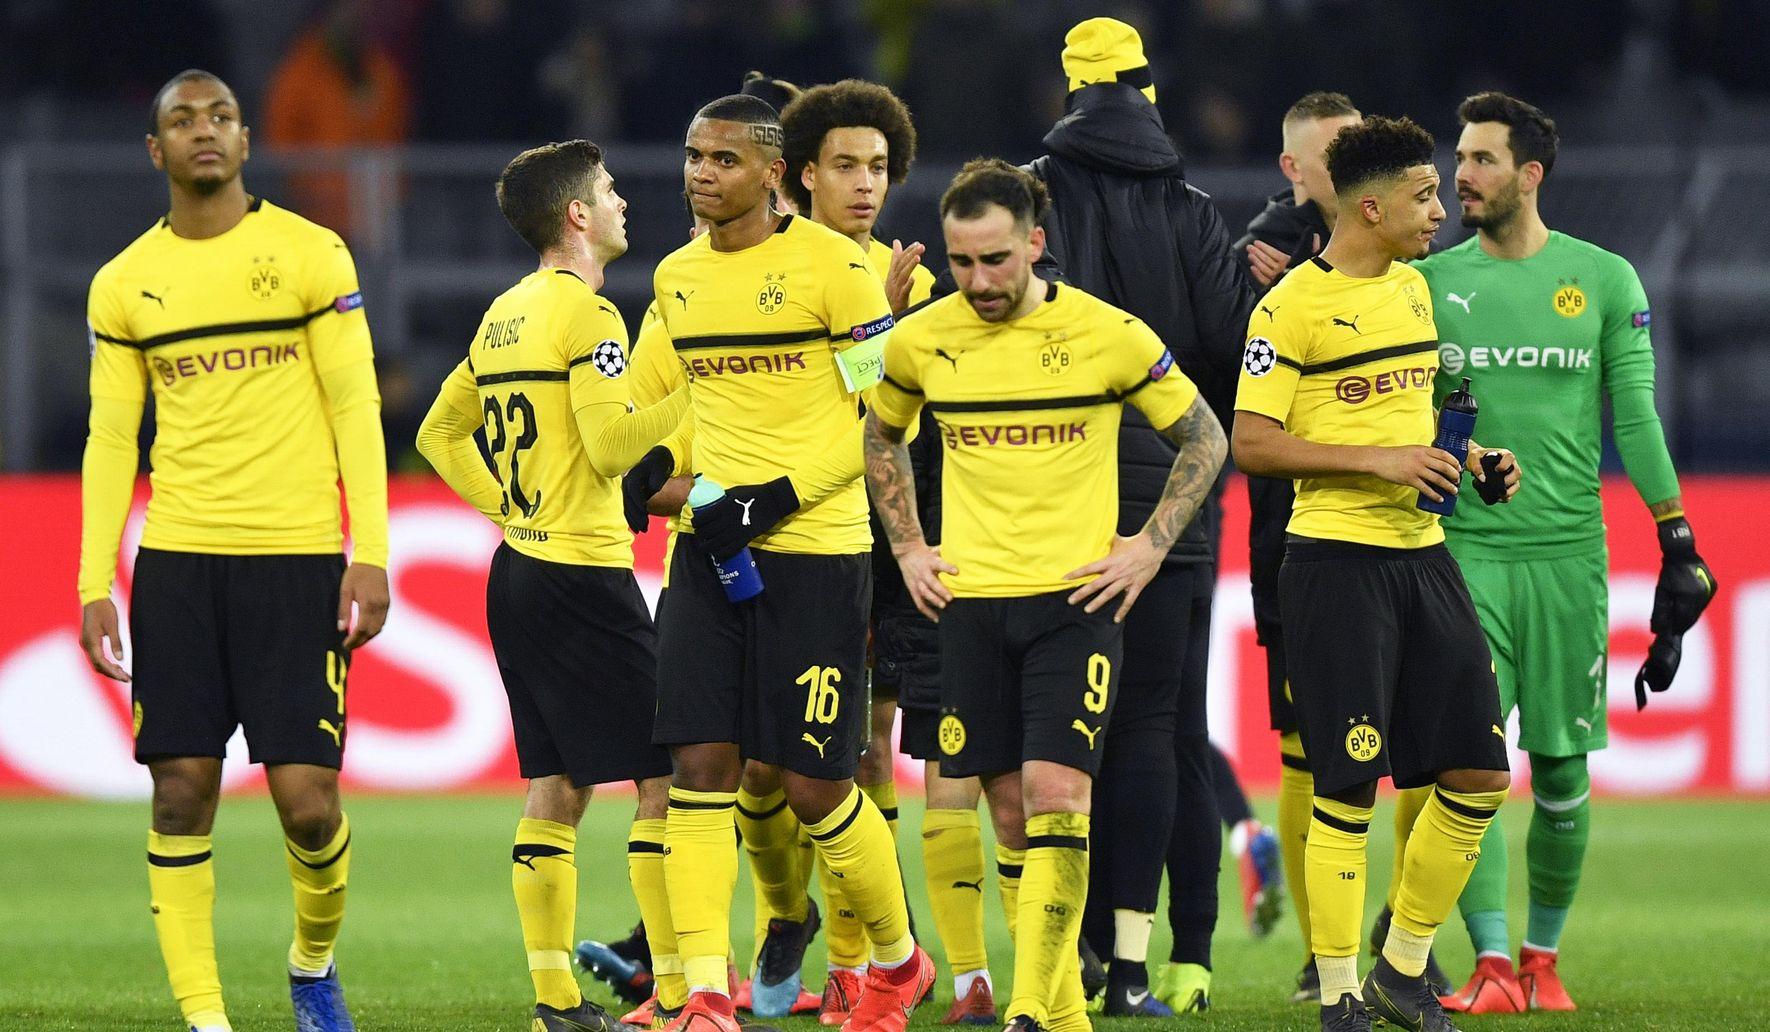 For Borussia Dortmund, it's the Bundesliga or bust - Washington Times